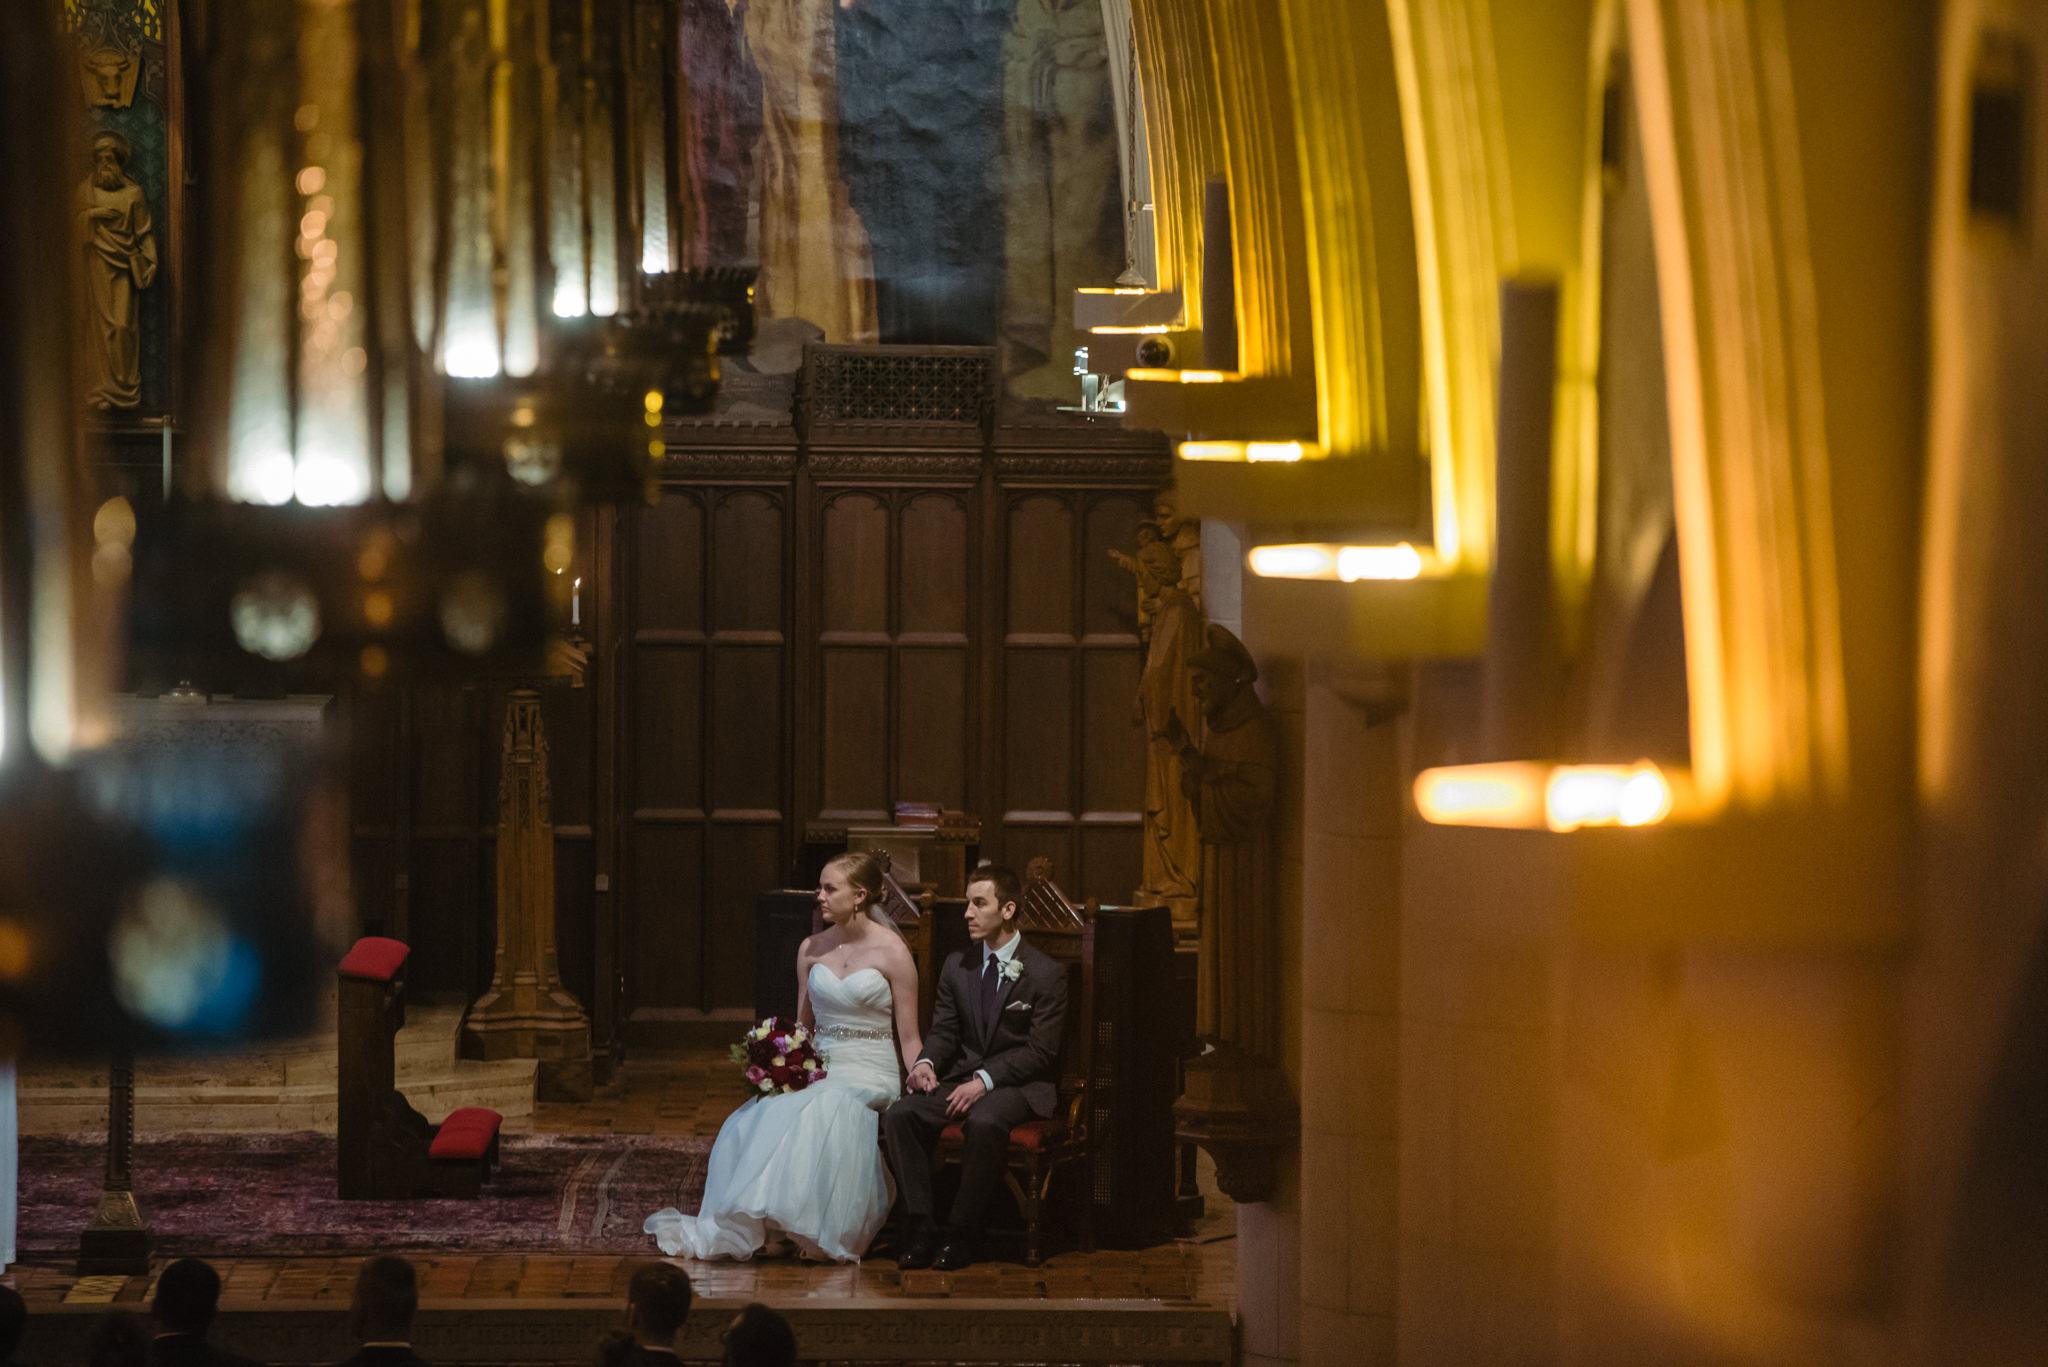 OMAHA-MARRIOTT-WEDDING-DOWNTOWN-MARRIOTT-OMAHA-WEDDING-PHOTOGRAPHER-JM-STUDIOS-017.jpg